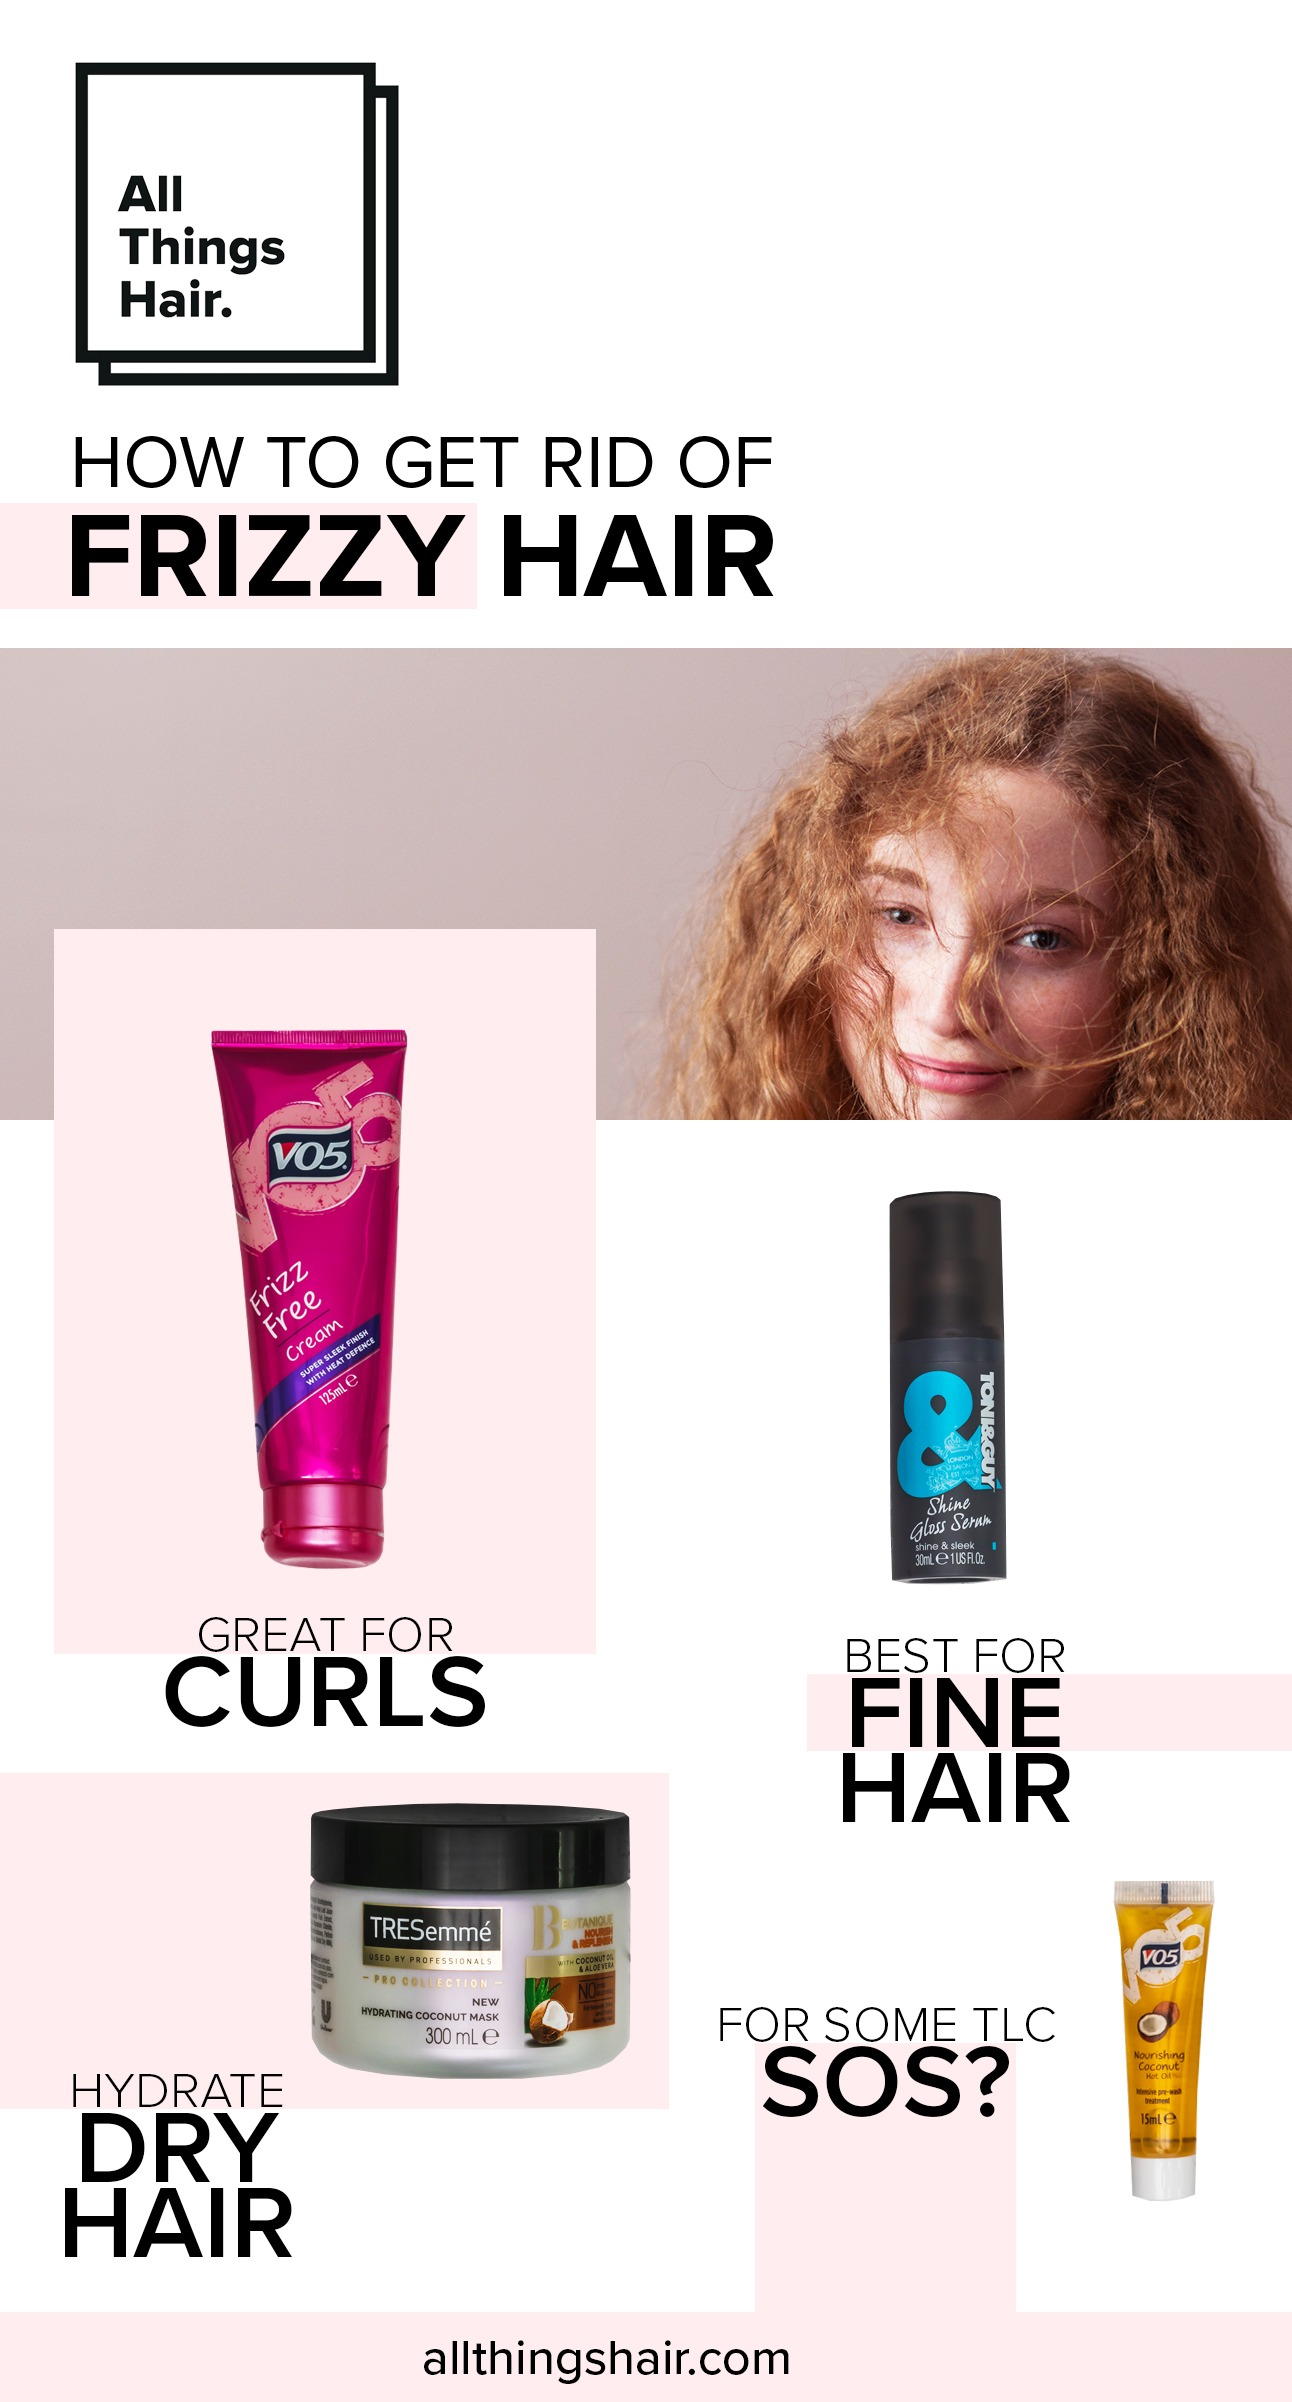 Frizzy hair infographic by all things hair uk : Photos de différents produits capillaires qui aident à dompter les frisottis